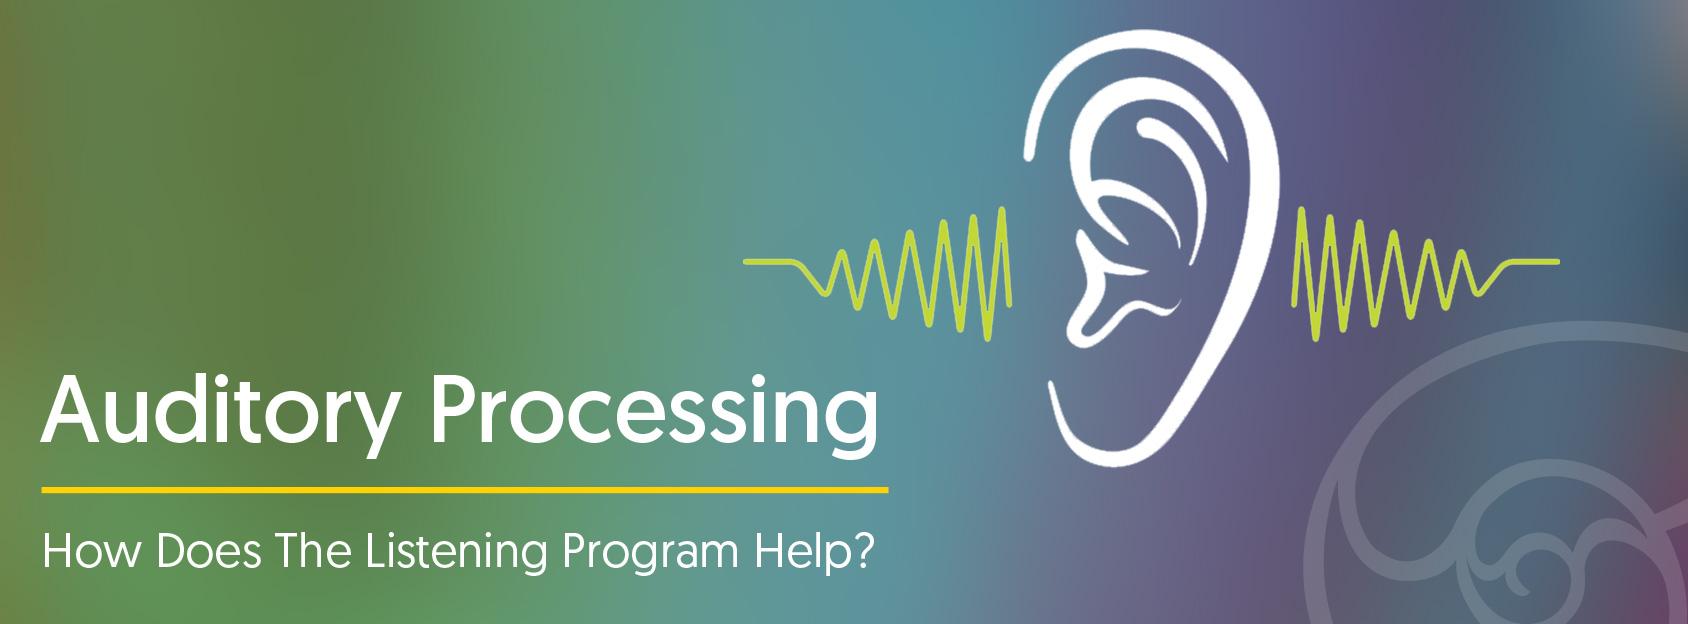 auditory-processing-the-listening-program-jpg